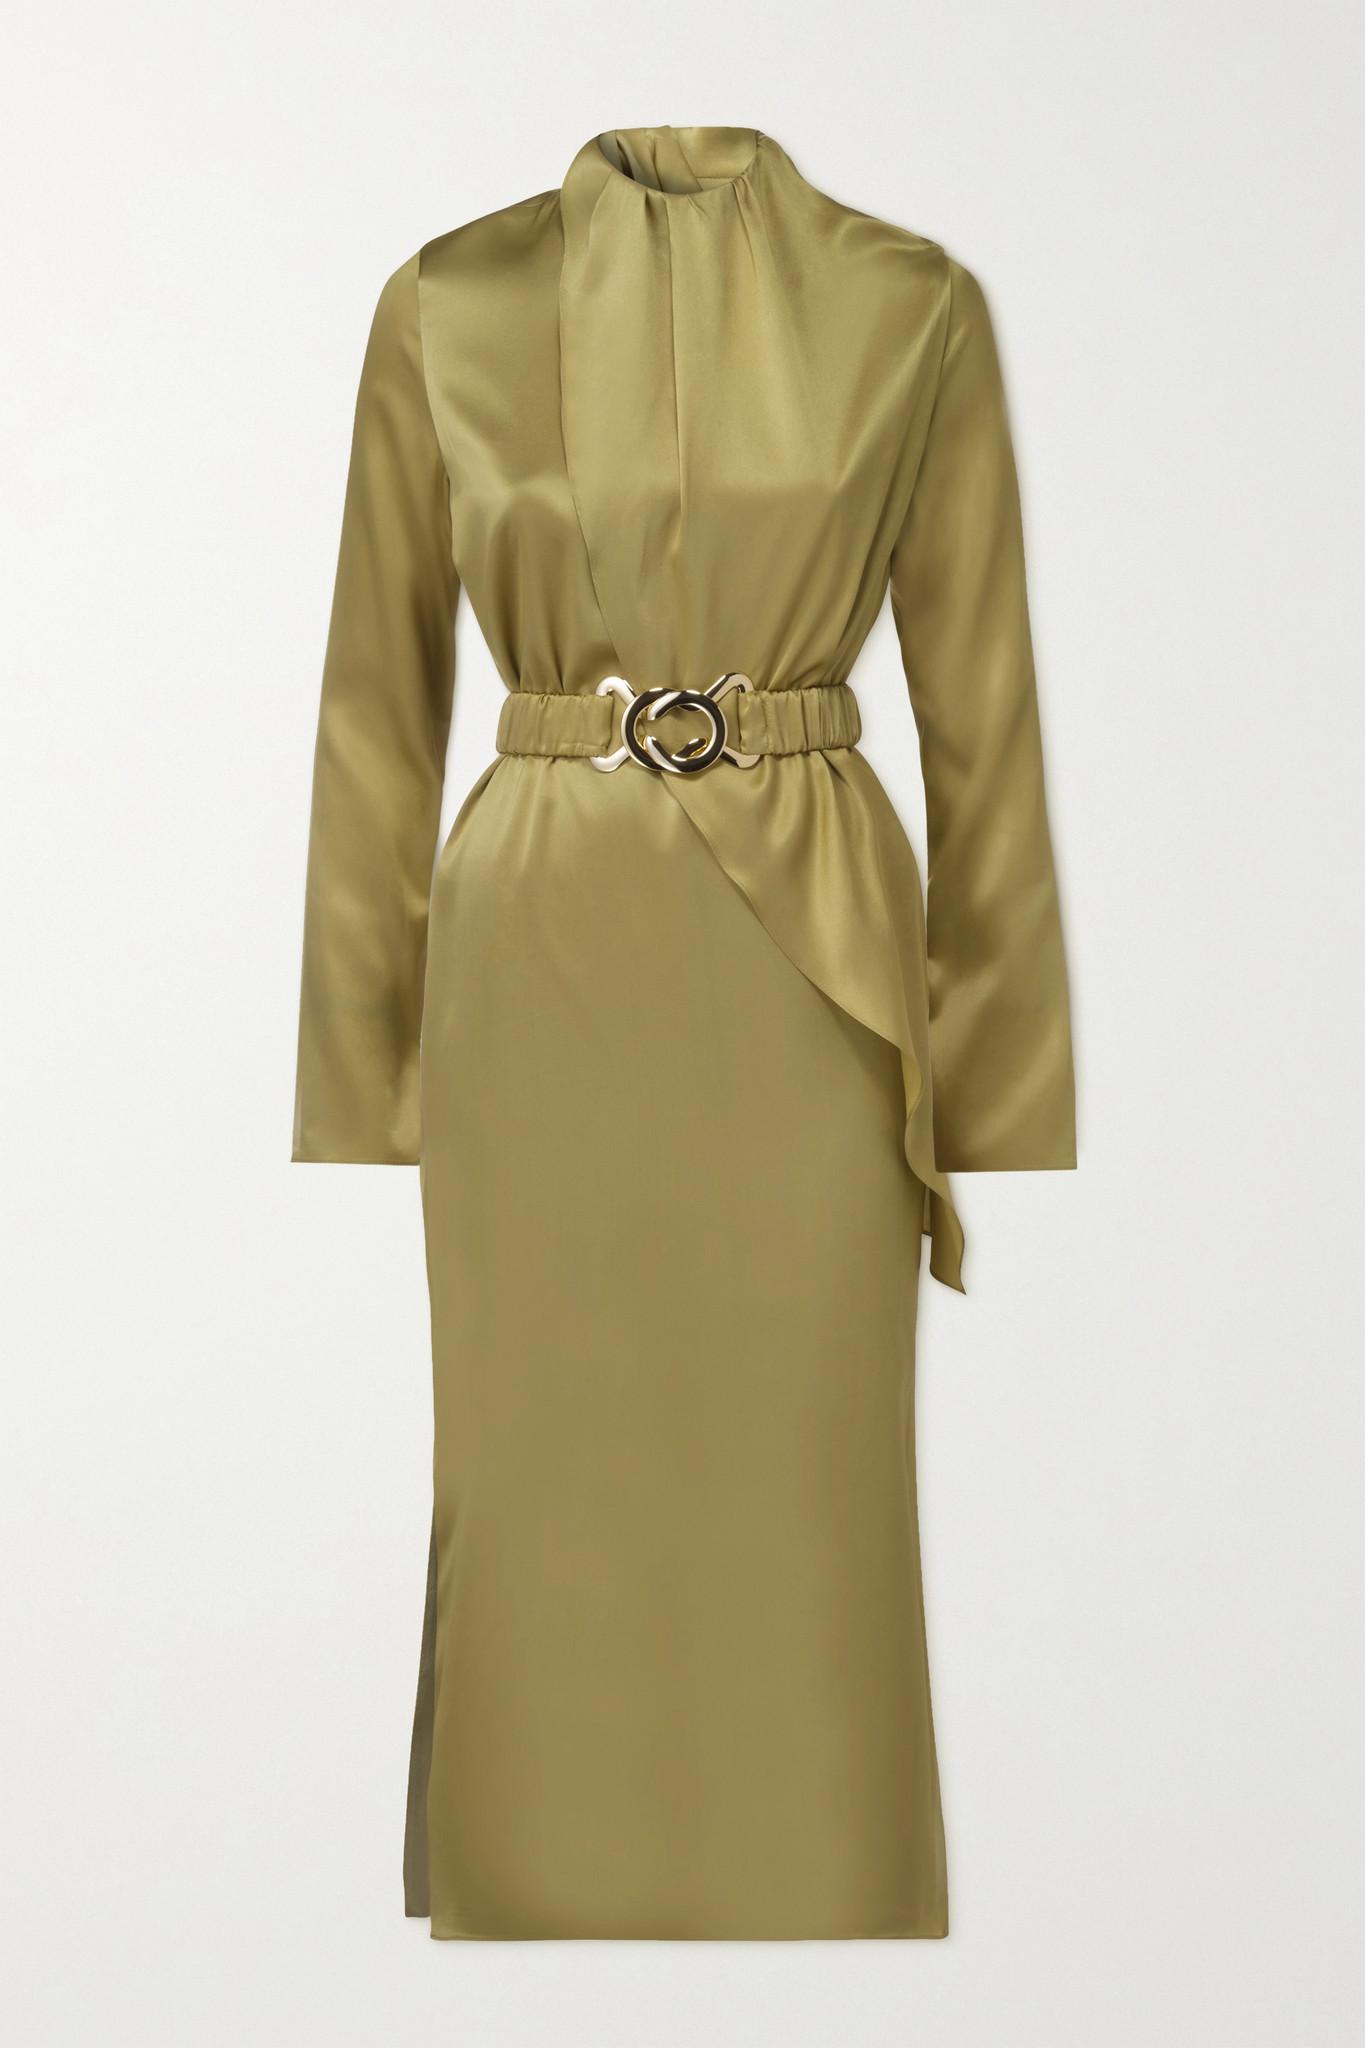 DODO BAR OR - Berna 配腰带垂坠丝缎中长连衣裙 - 绿色 - IT40